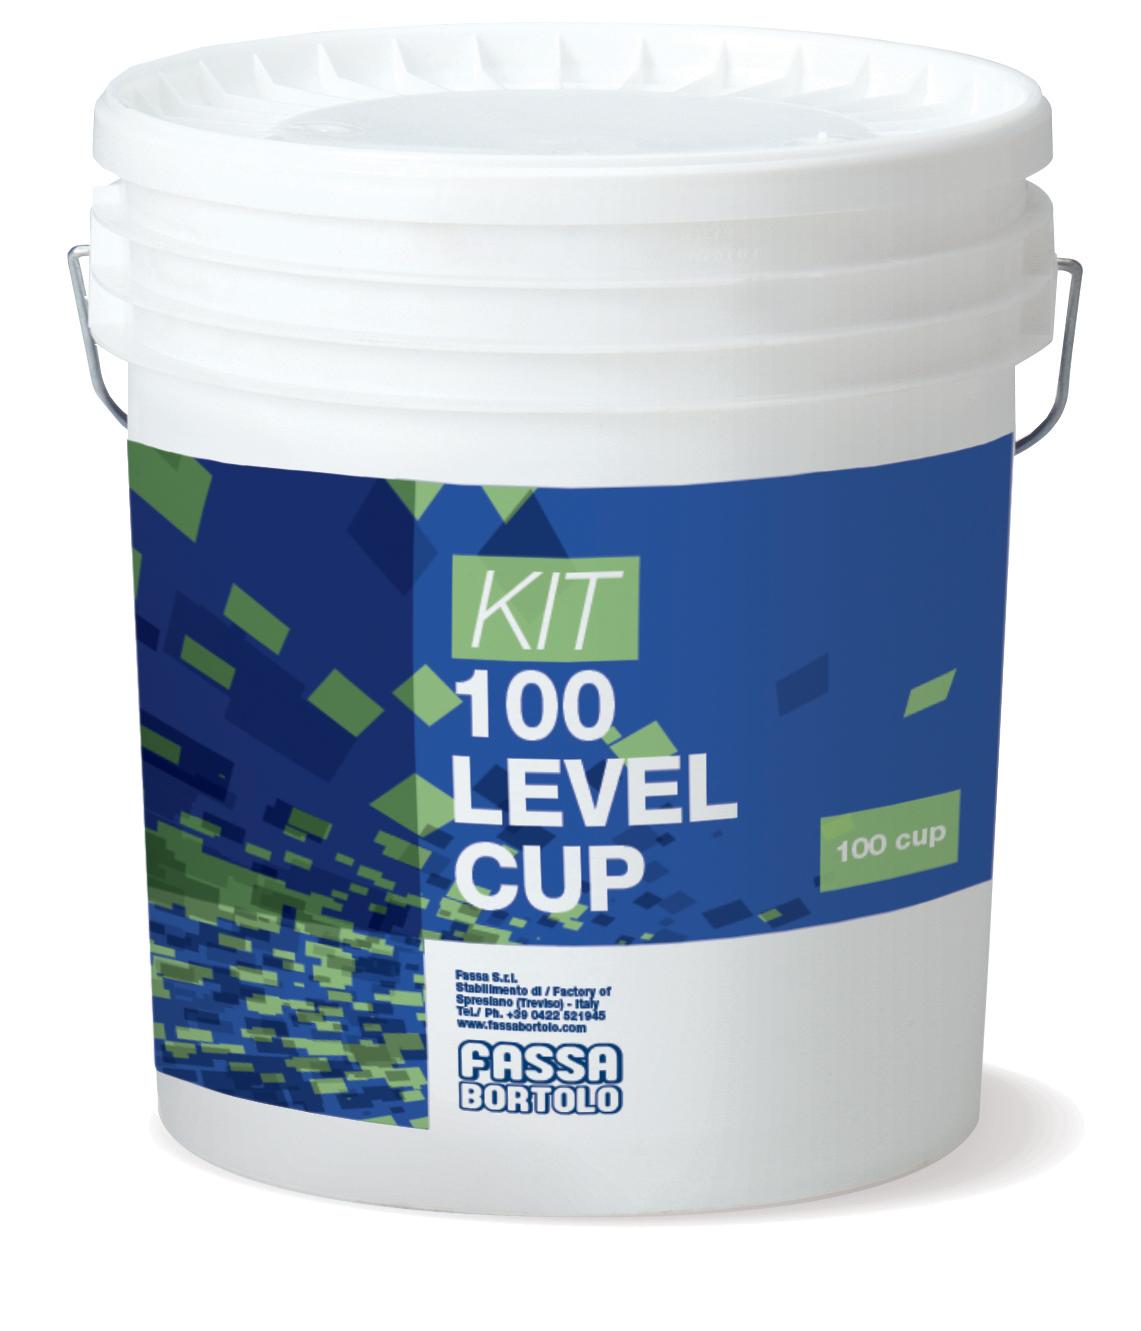 100er KIT LEVEL CUP: Kit bestehend aus 100 Ersatzteilen Cup